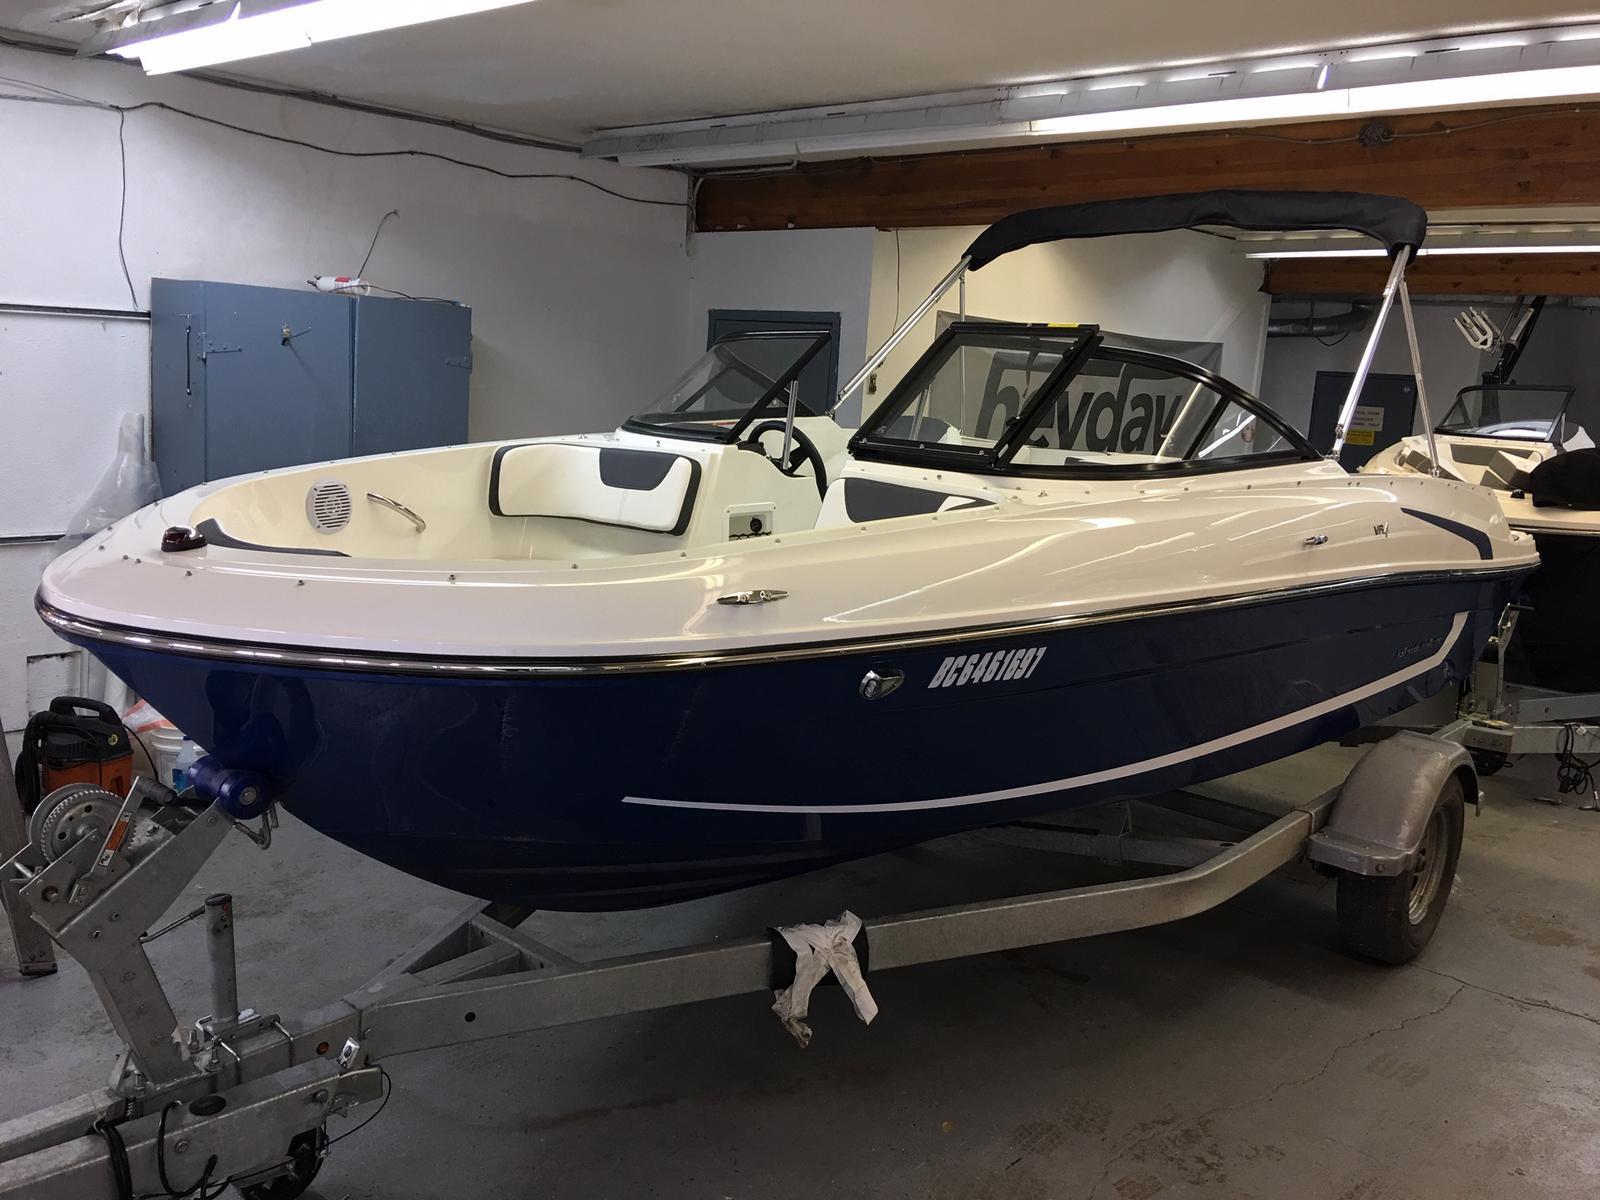 2019 Bayliner boat for sale, model of the boat is VR4 Bowrider & Image # 1 of 21